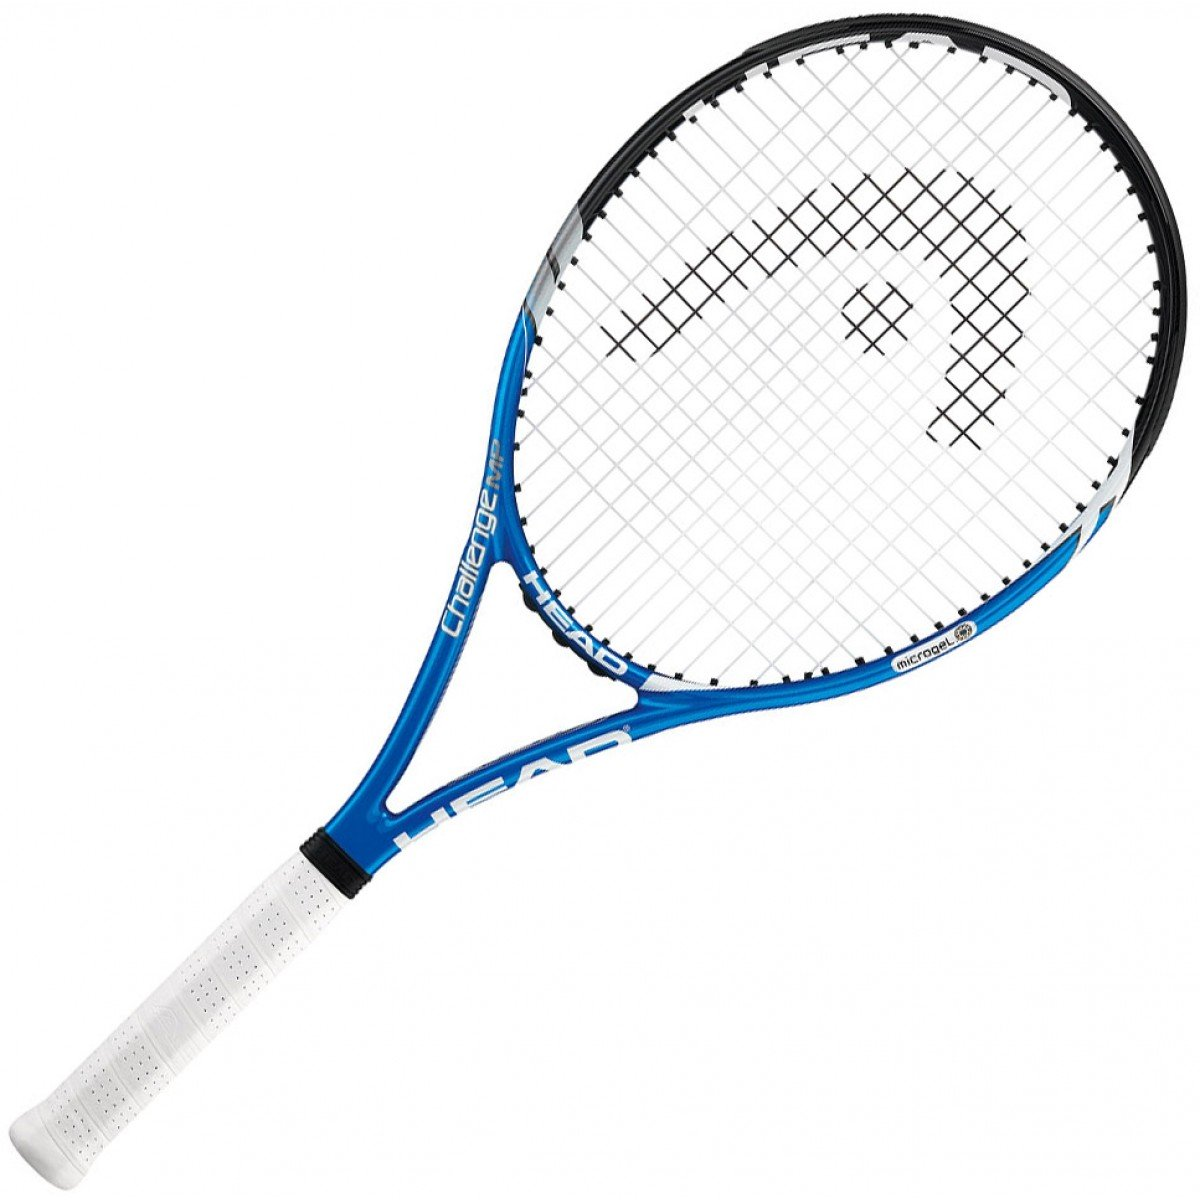 tennis racquet drawing at getdrawings com free for personal use rh getdrawings com Tennis Player Clip Art Funny Tennis Clip Art